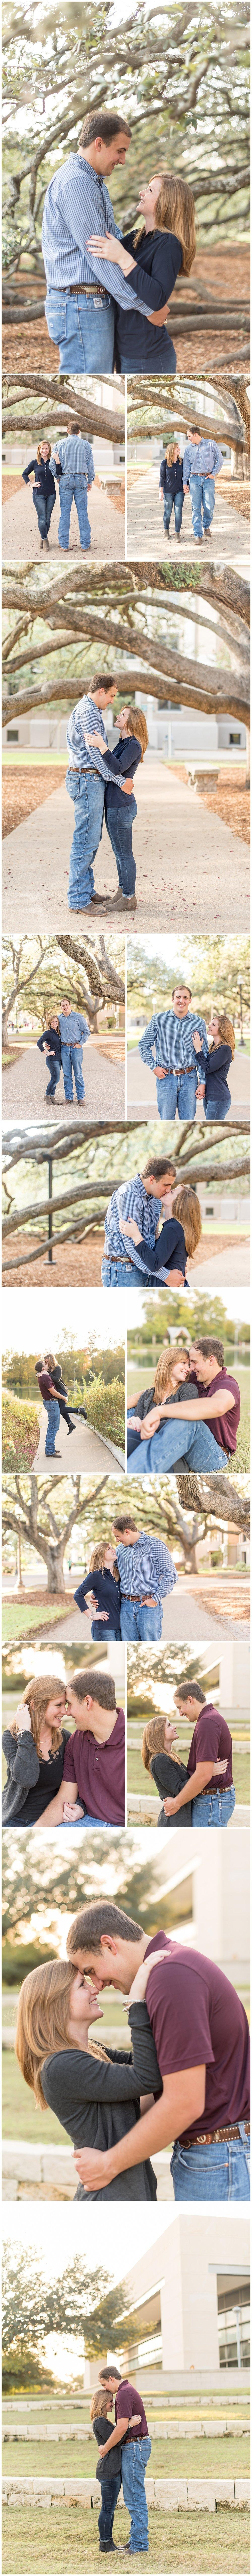 Lauren & Ty Engagement.jpg